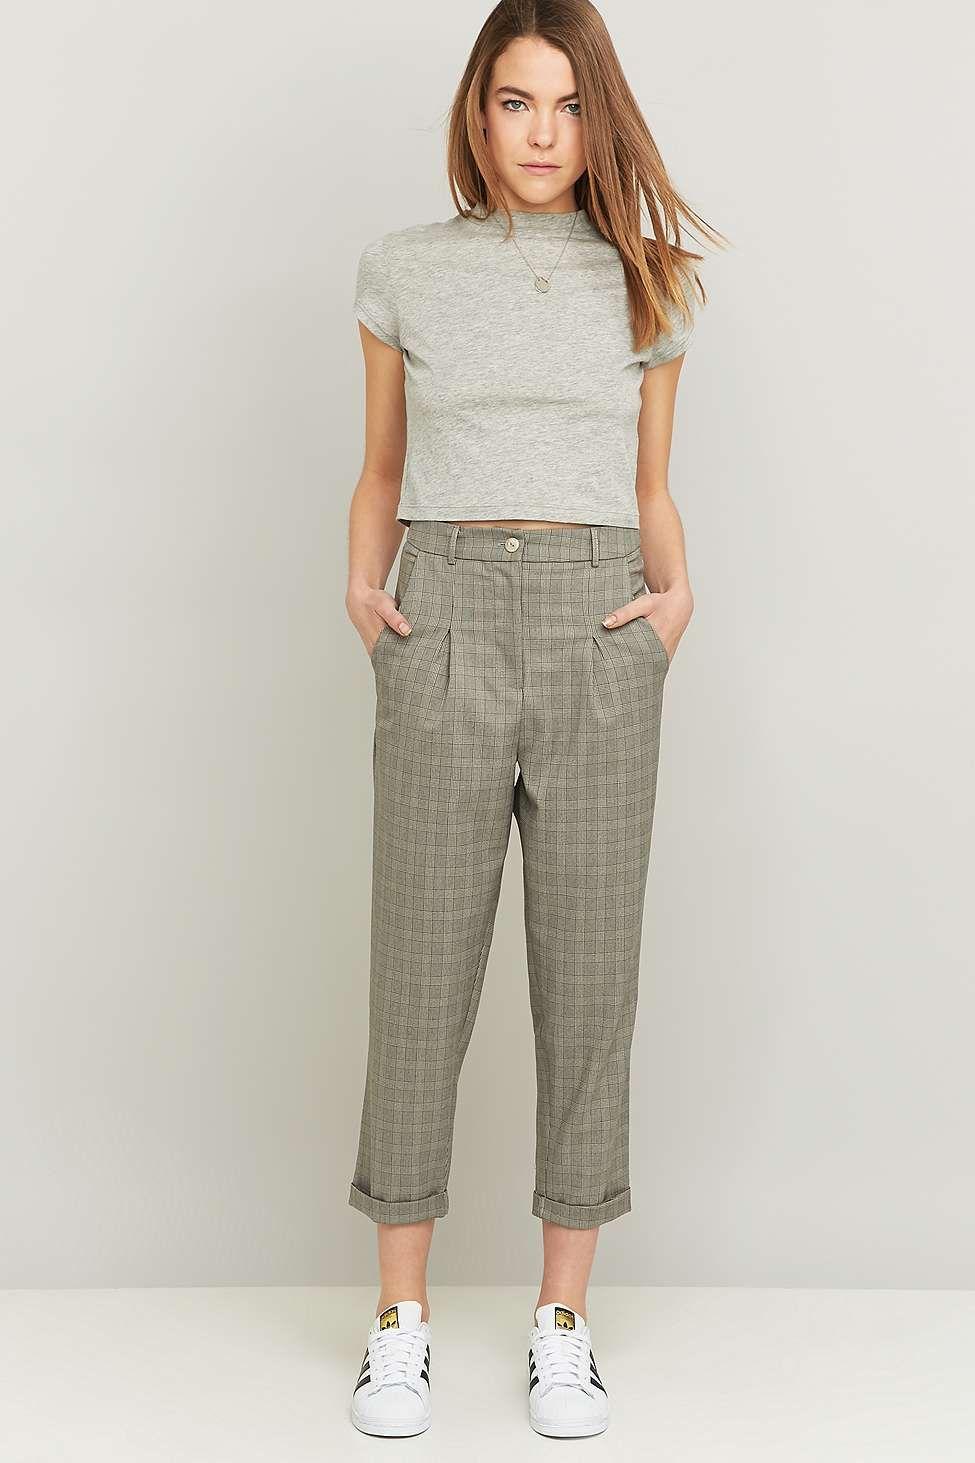 Urban Renewal Vintage Remnants - Pantalon à carreaux